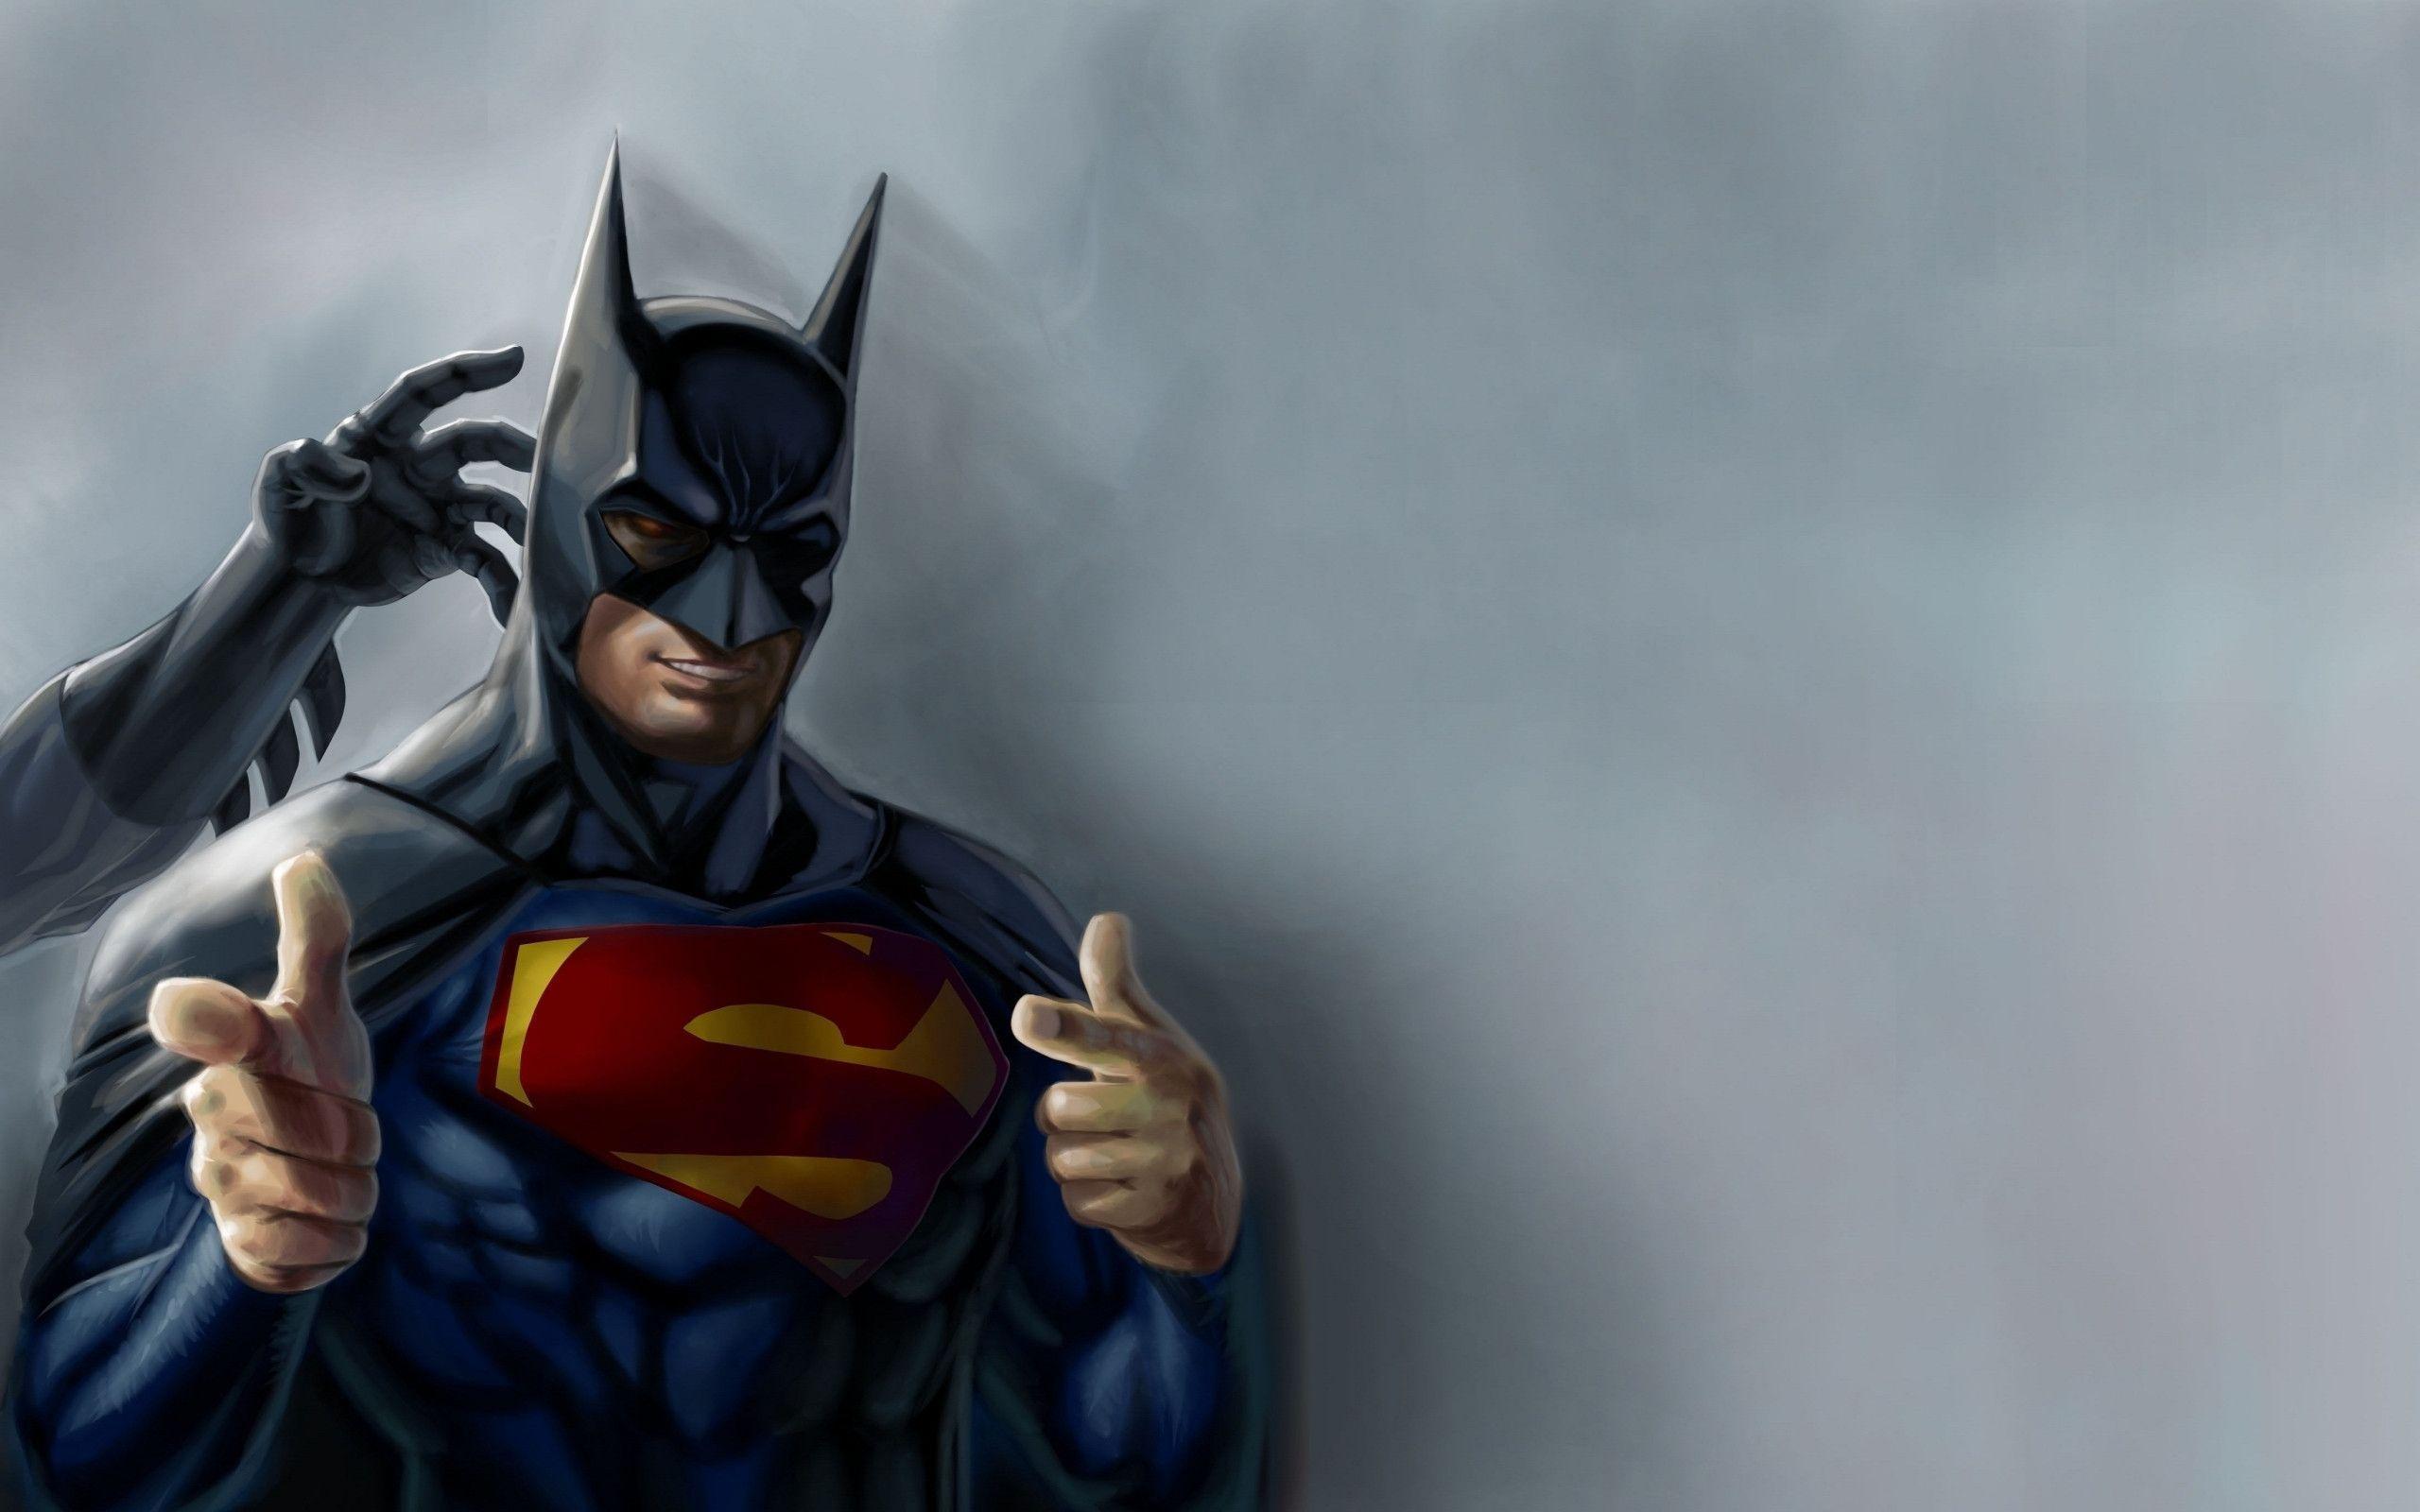 Superhero Wallpapers 2560x1600